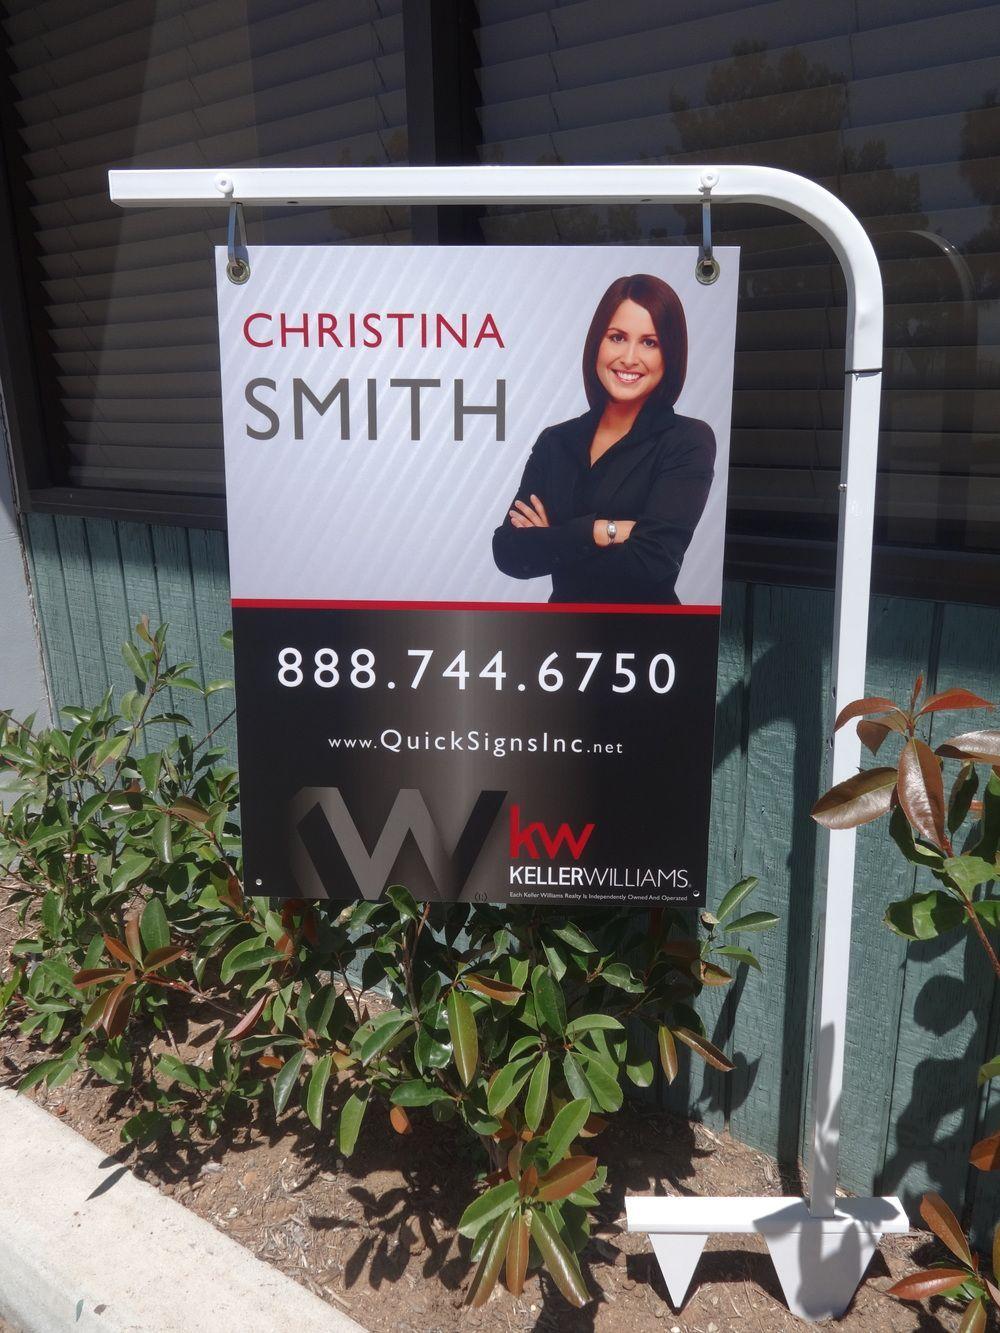 Keller williams realty quick signs advertising inc